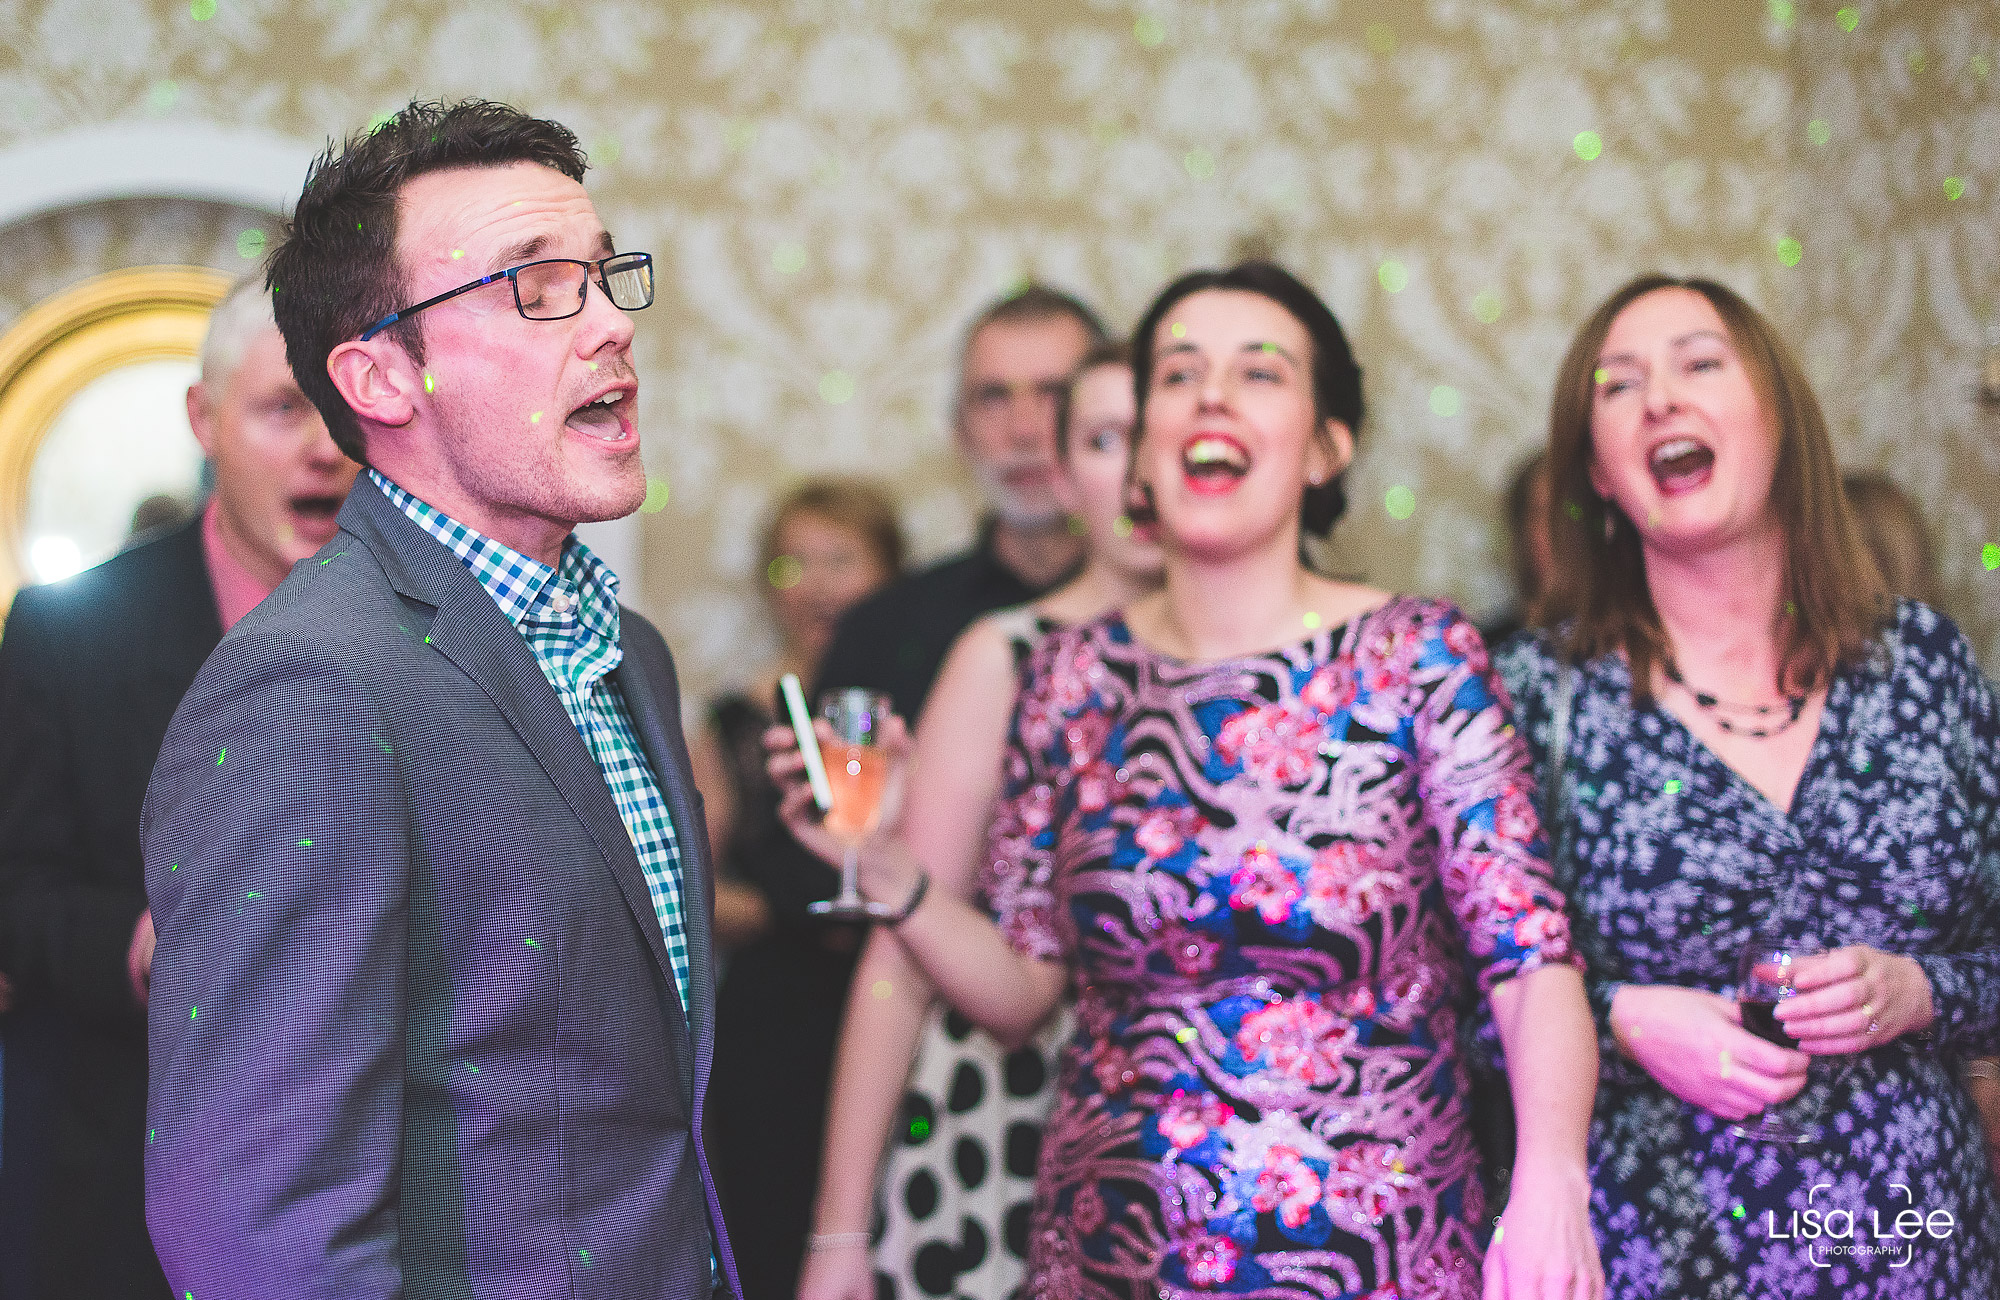 lisa-lee-wedding-photography-singing.jpg